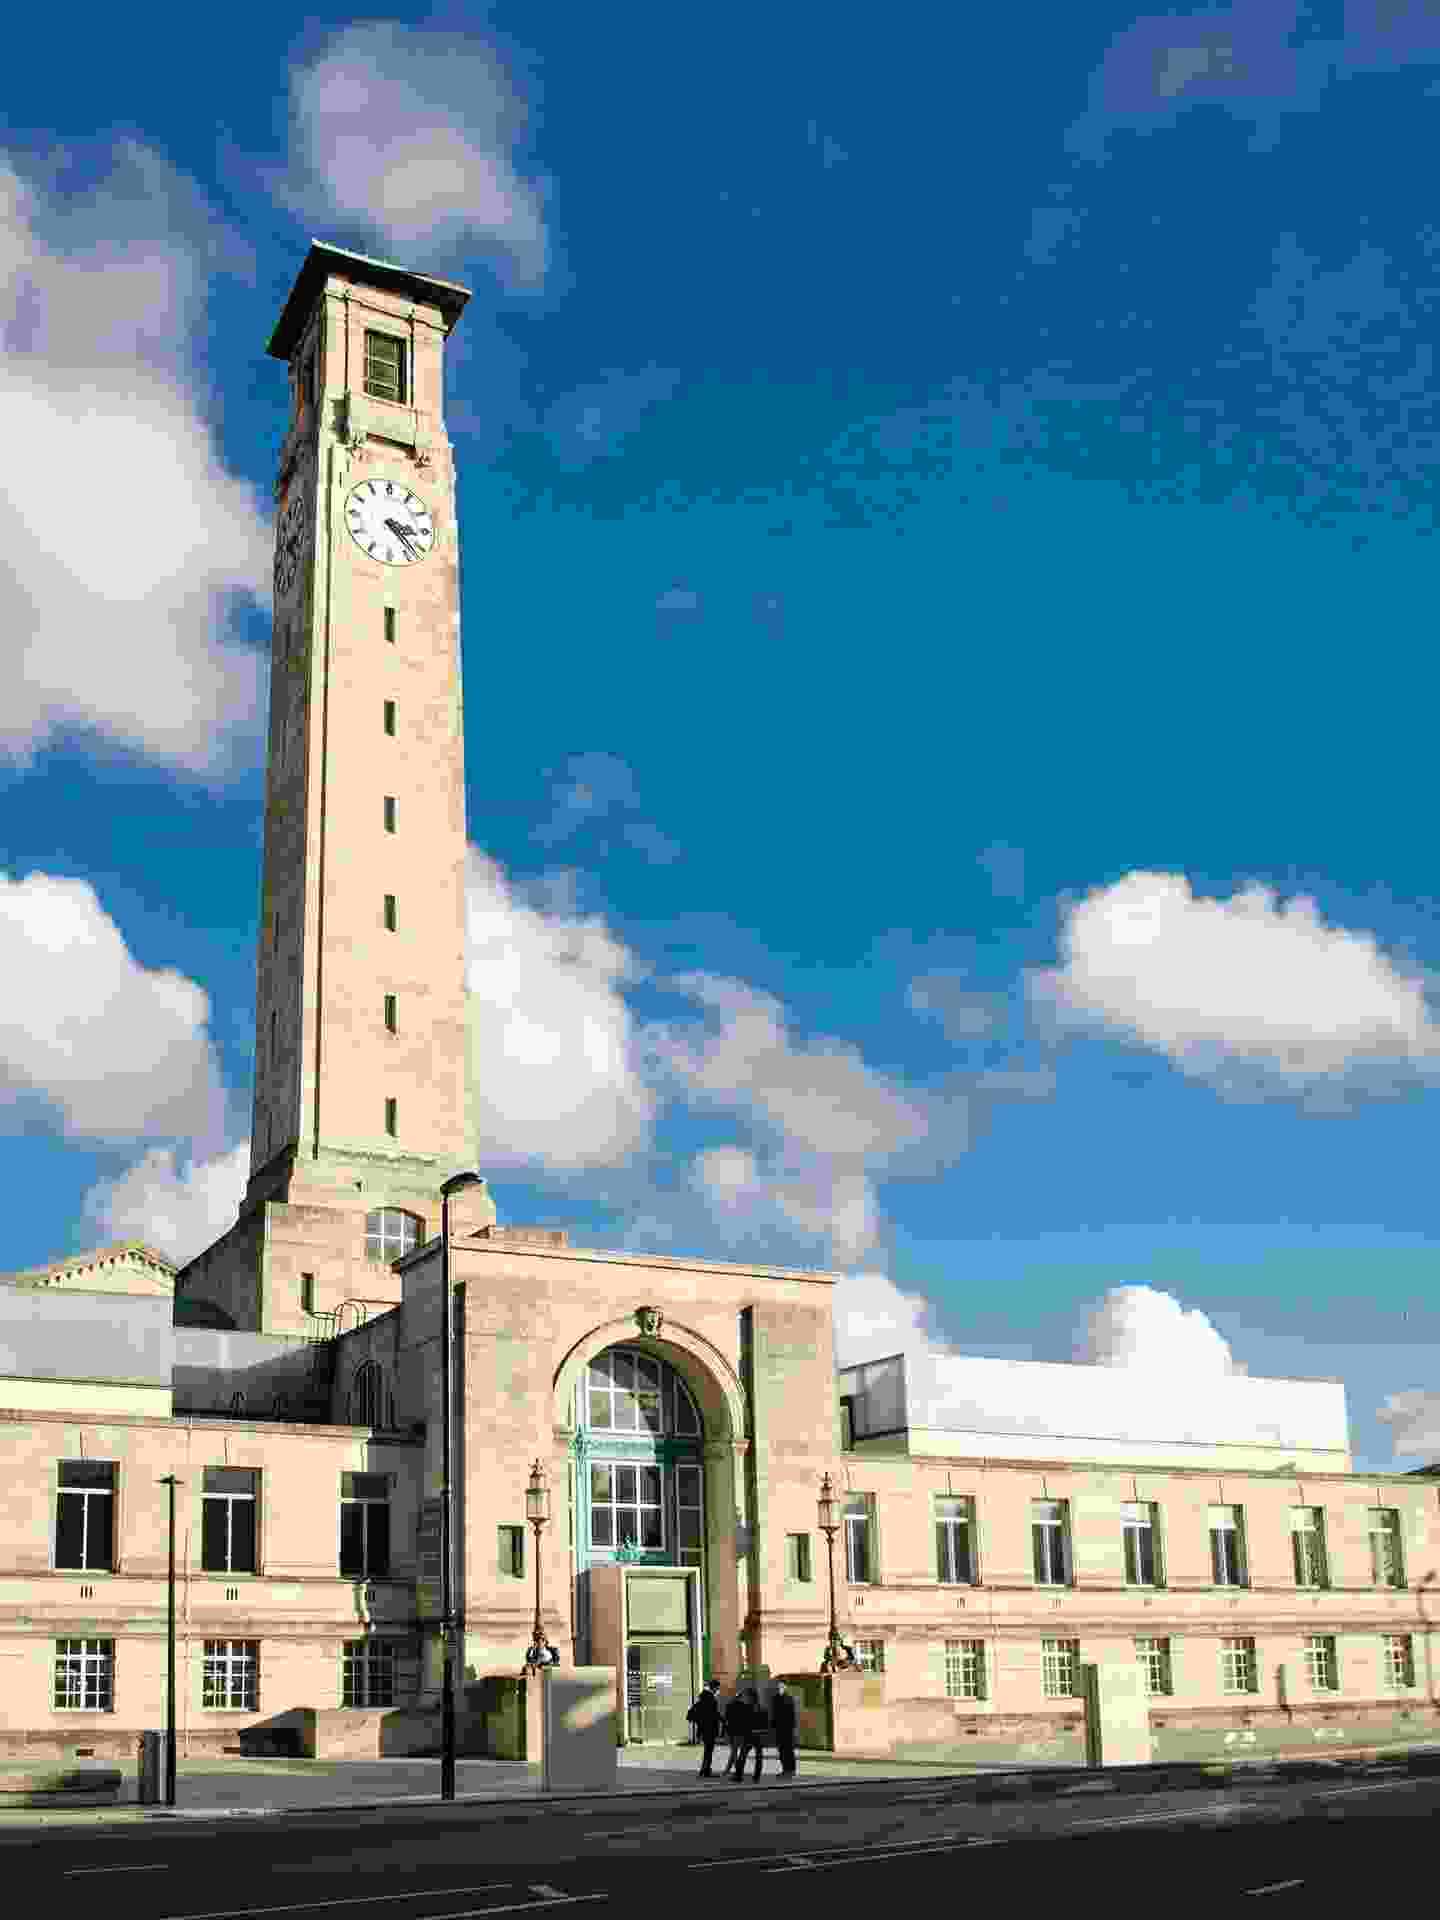 Southampton (Shutterstock)